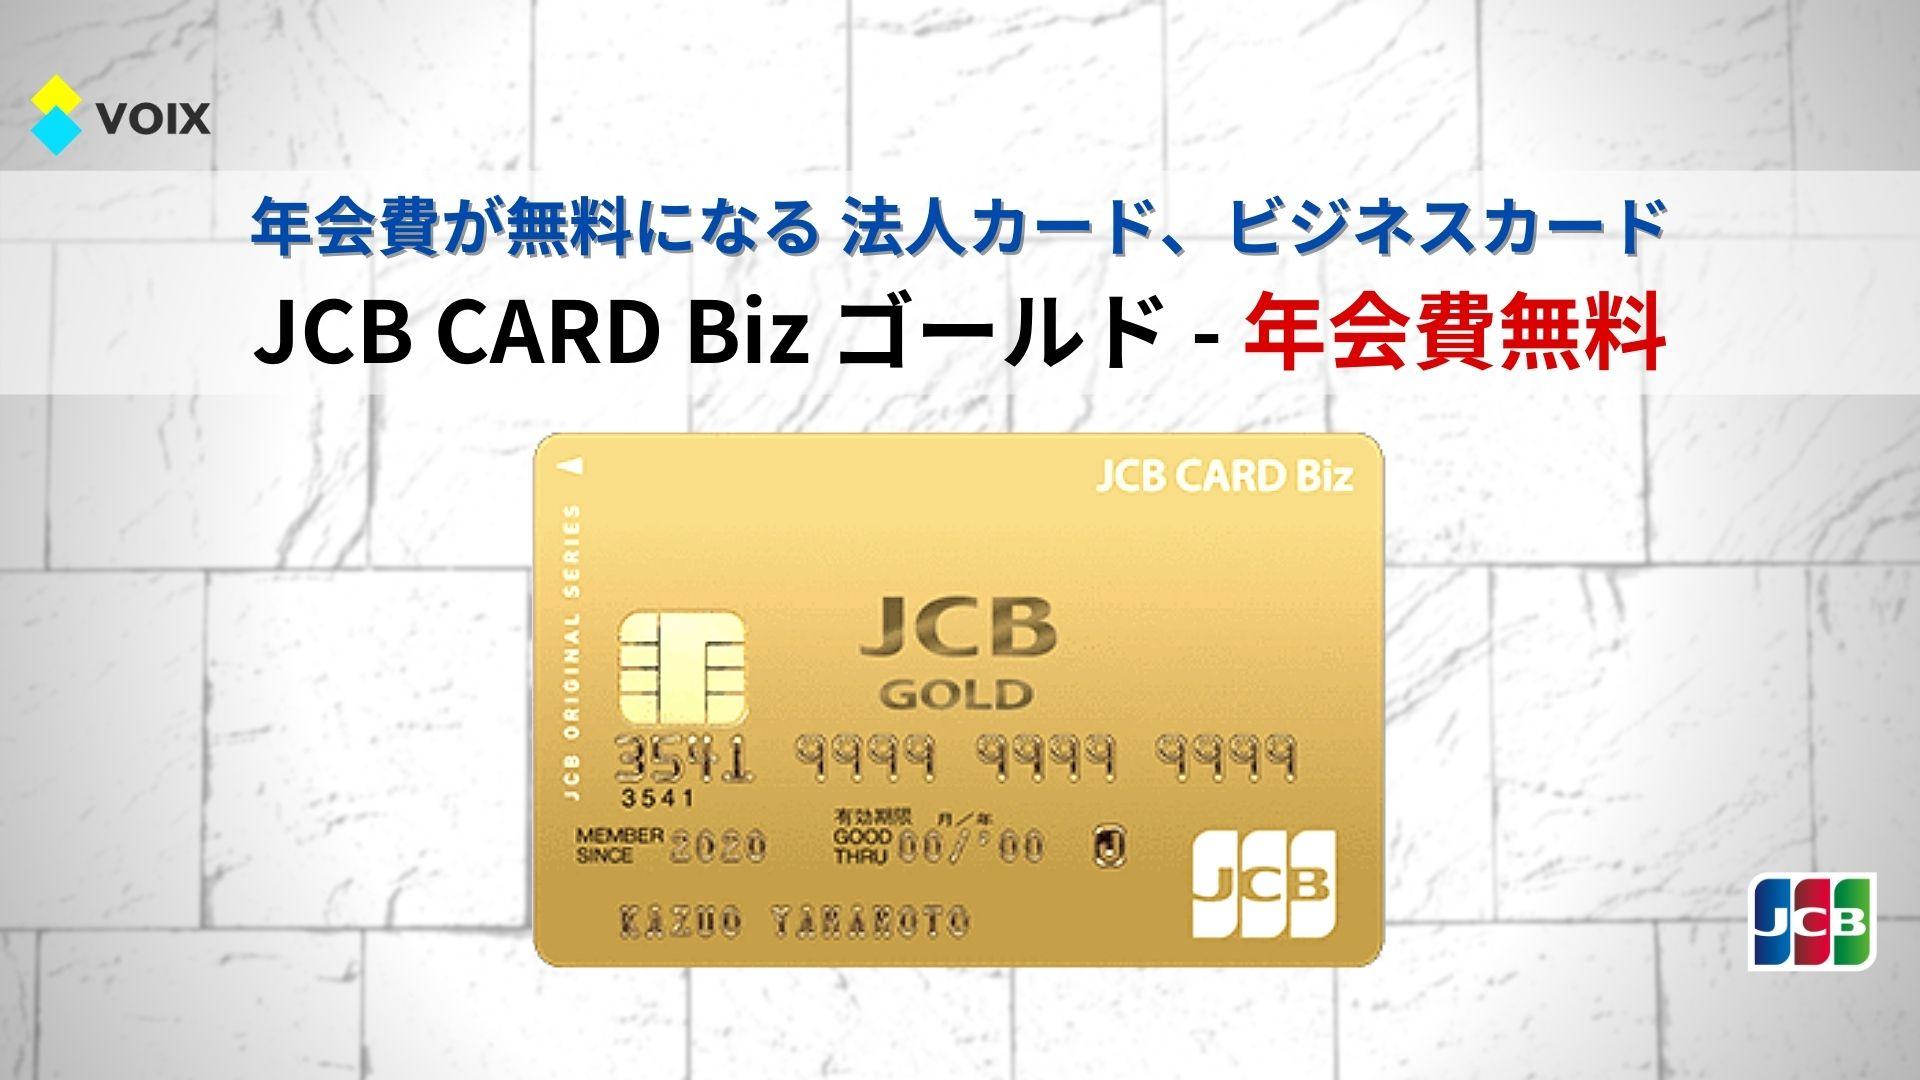 JCB CARD Biz ゴールド – 年会費無料 - メリット、年会費、限度額、審査、ETC、特典、締め日 など